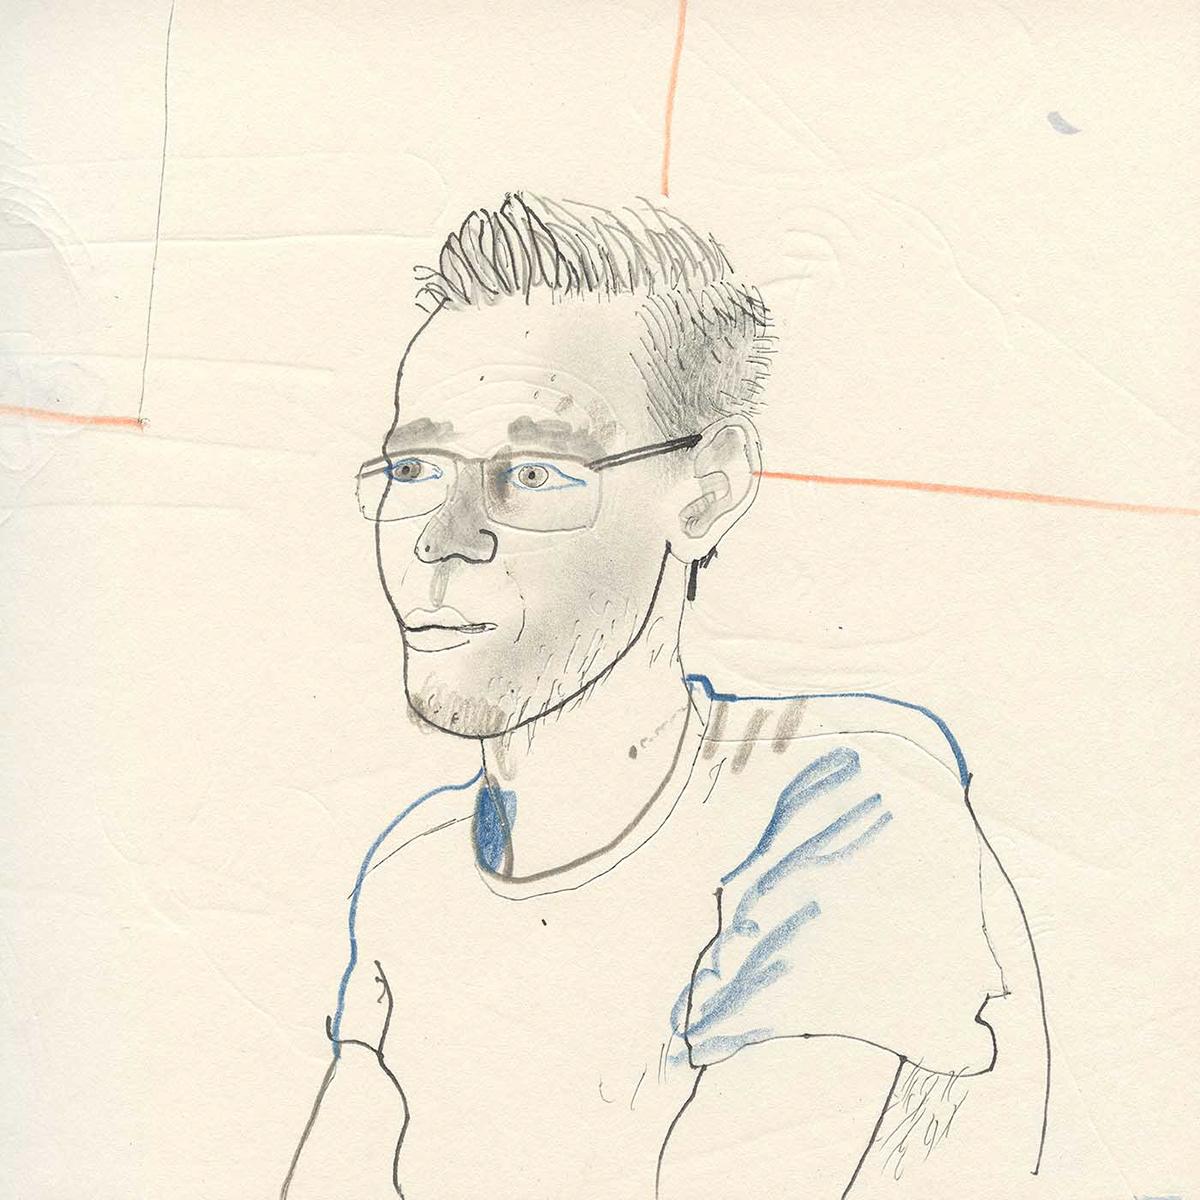 DEREK BACON ILLUSTRATION  portraits sketchbook people studies faces figures life drawing Drawing  life studies